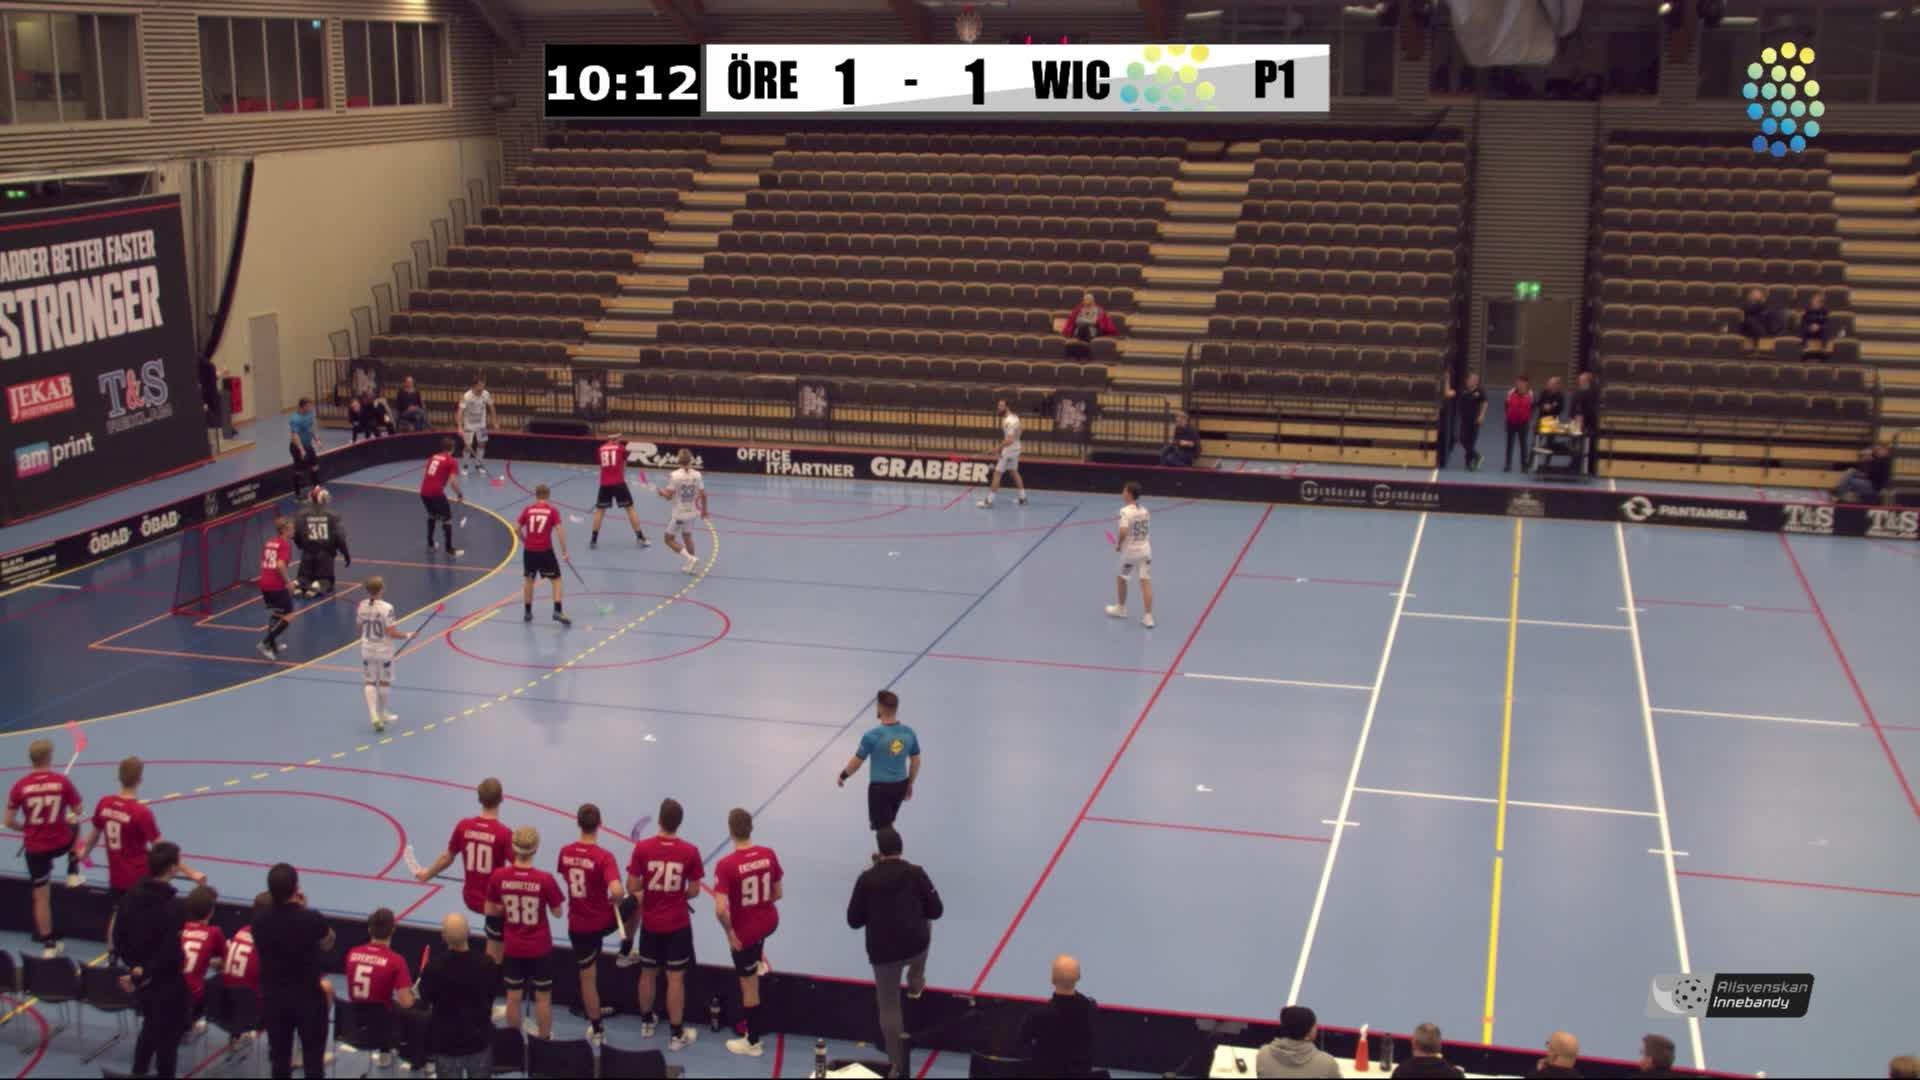 Highlights IBF Örebro - Warberg IC